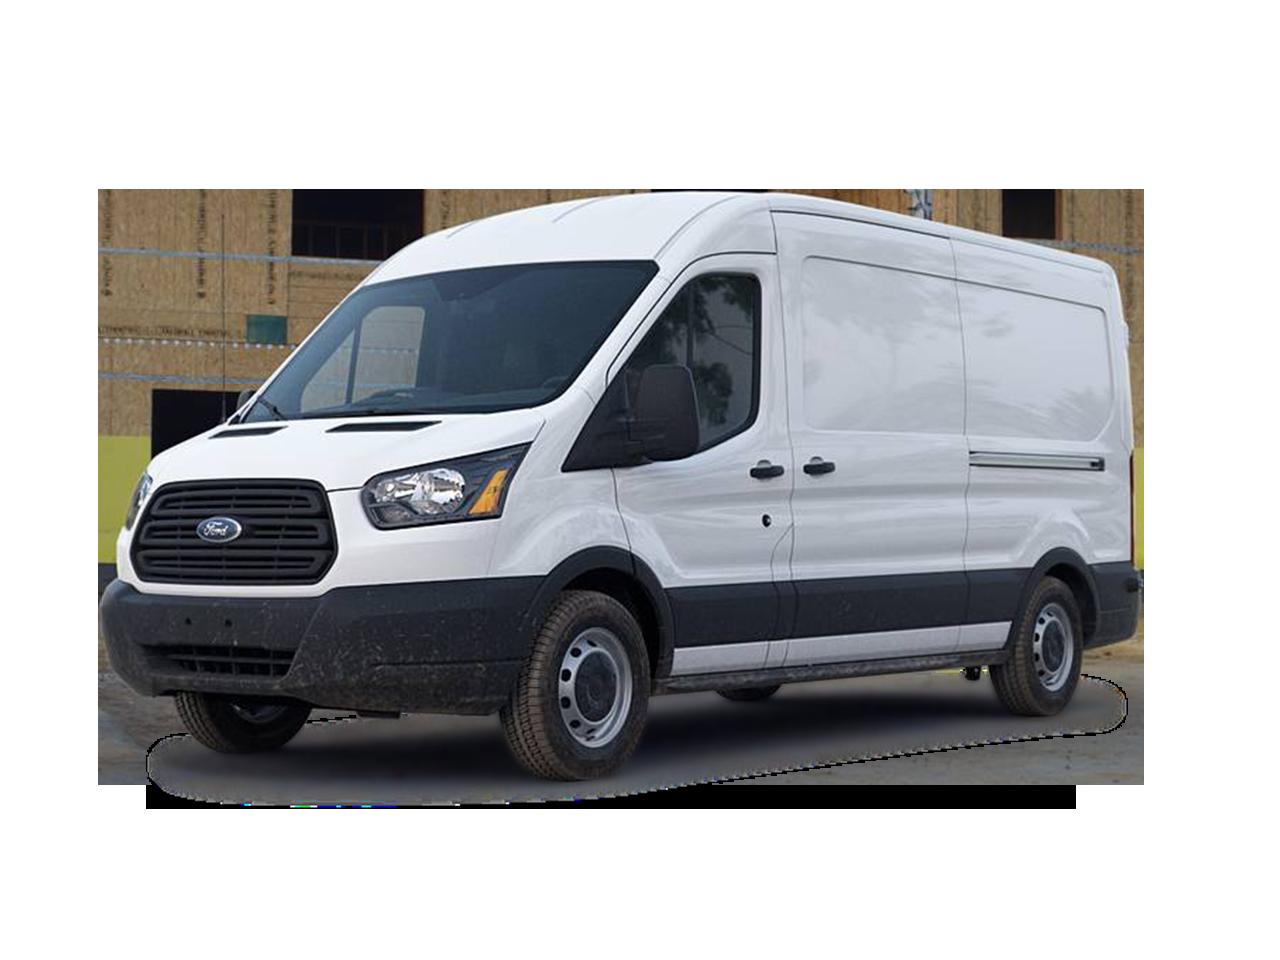 2018 Ford Transit  sc 1 st  Mossy Ford & 2018 Ford Transit | Info u0026 Pricing | Mossy Ford San Diego markmcfarlin.com